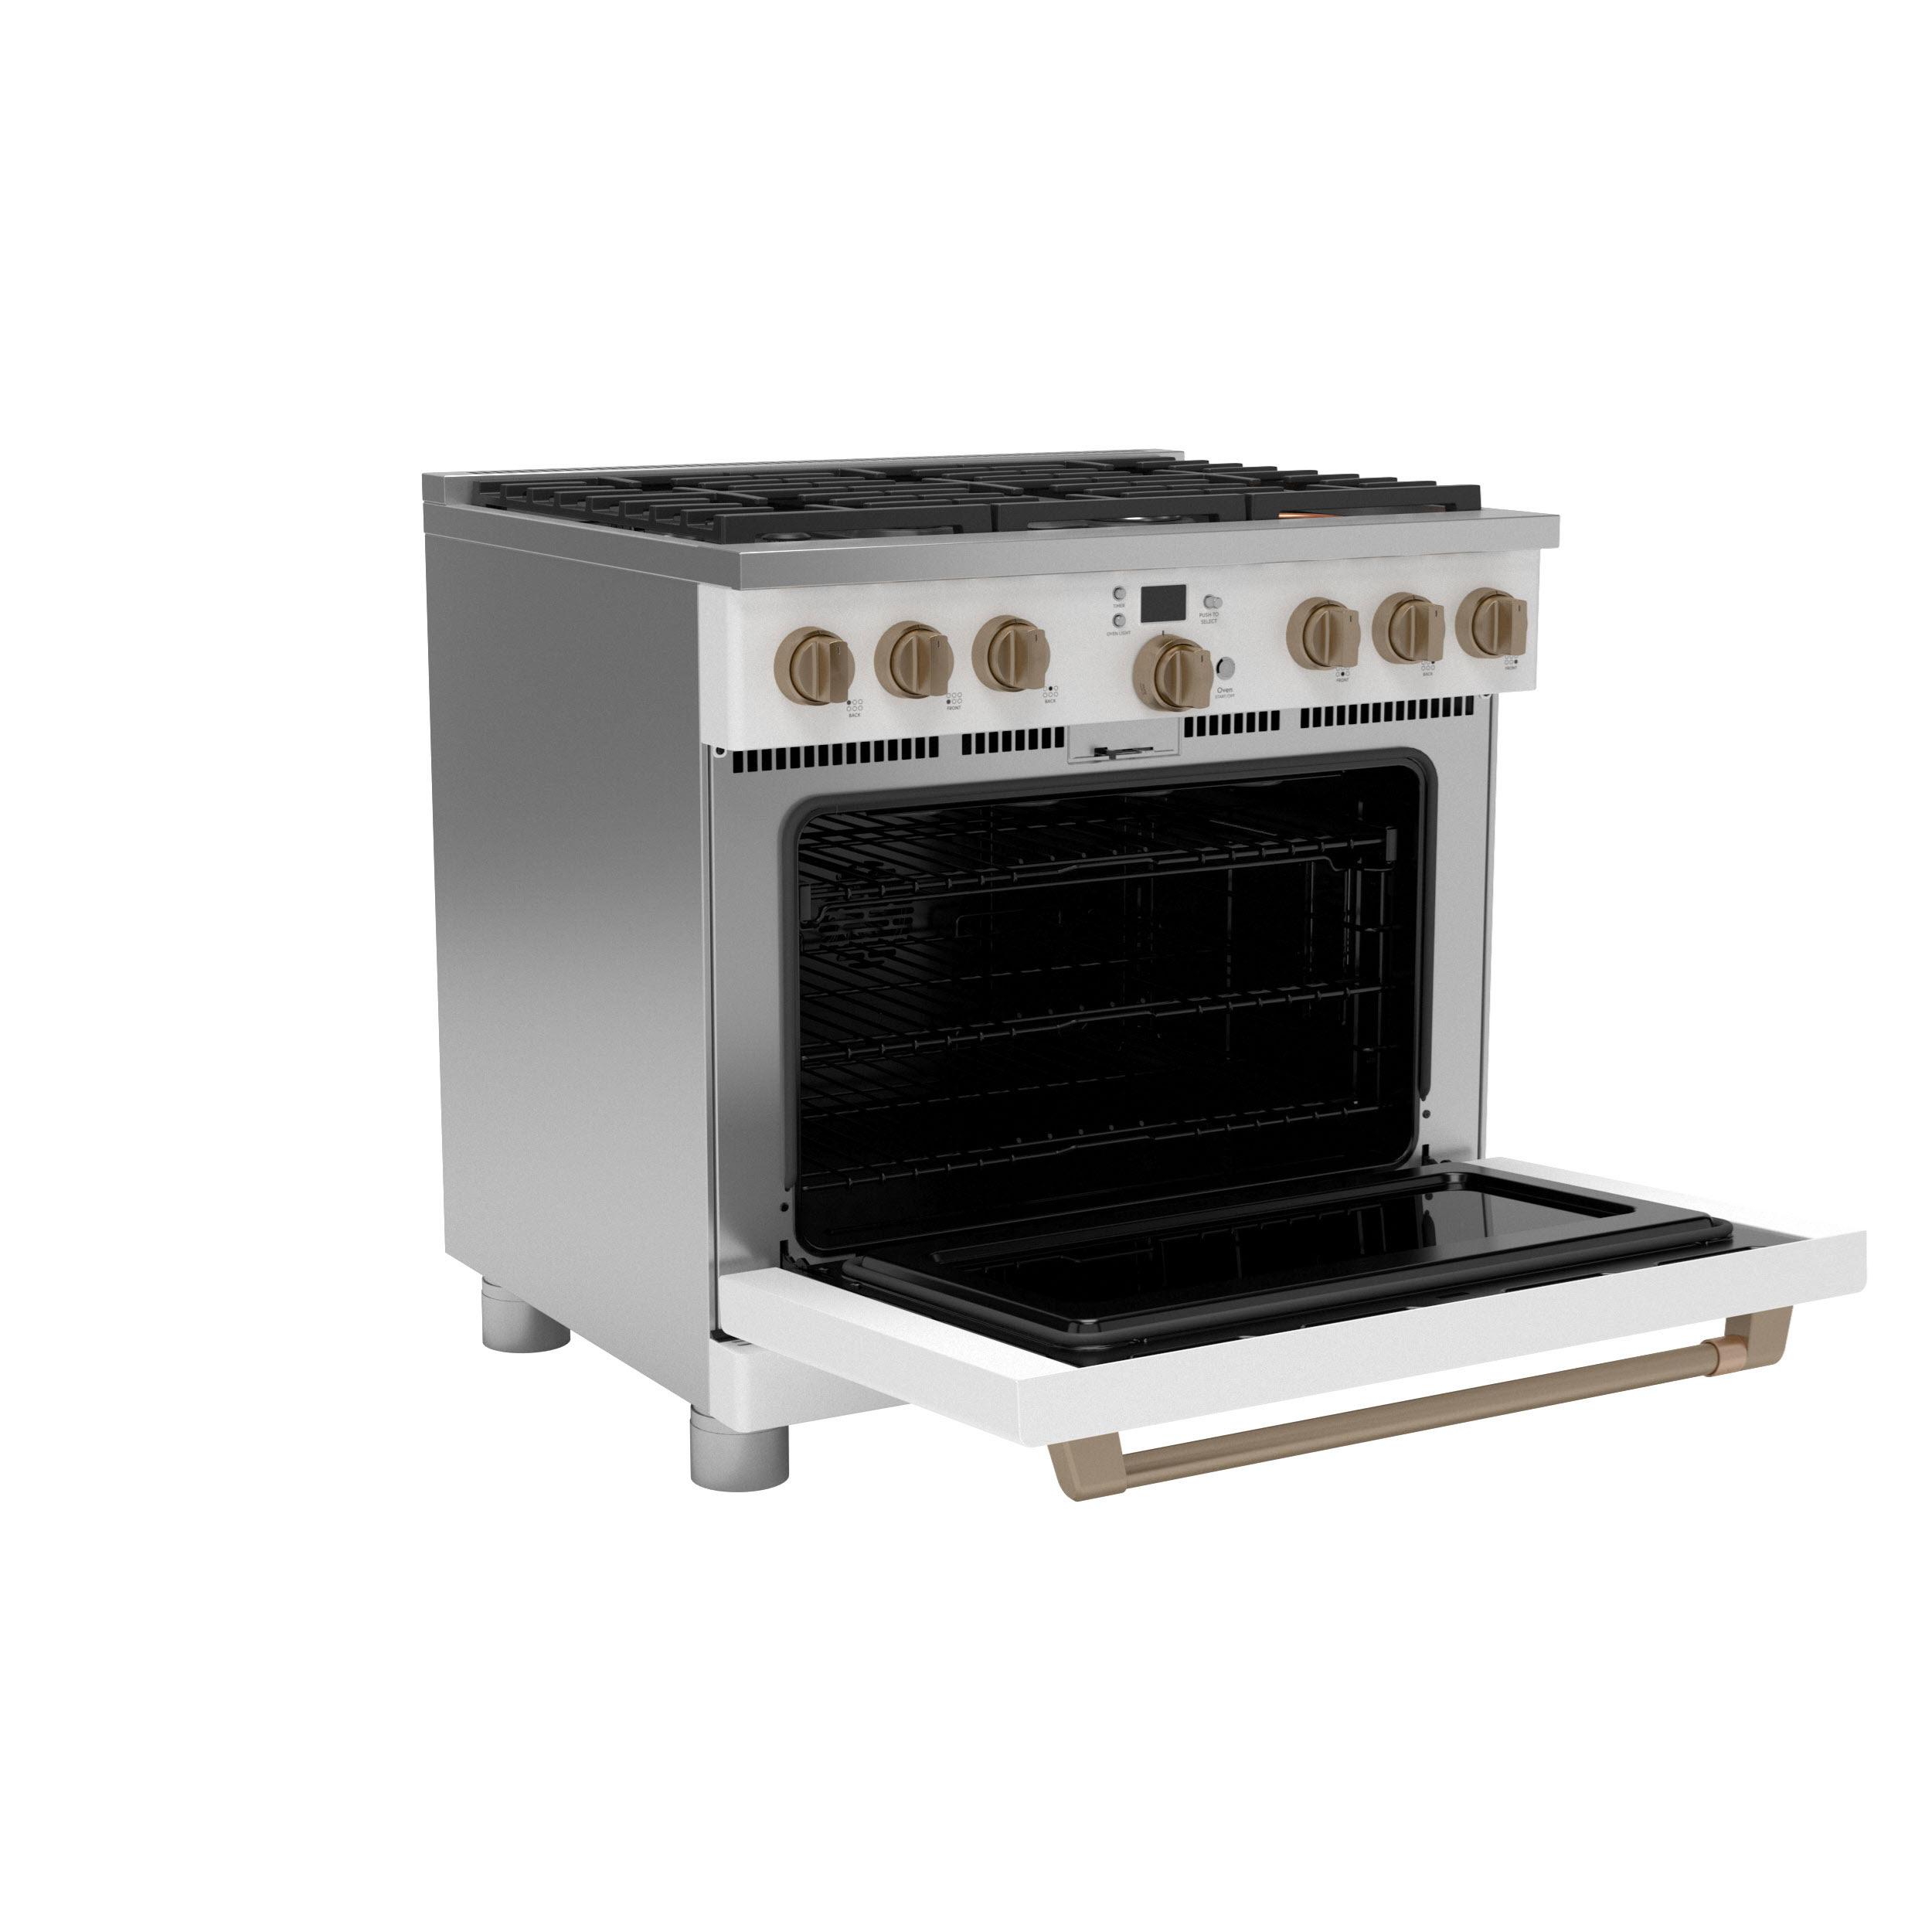 "Model: C2Y366P4TW2   Cafe Café™ 36"" Smart Dual-Fuel Commercial-Style Range with 6 Burners (Natural Gas)"